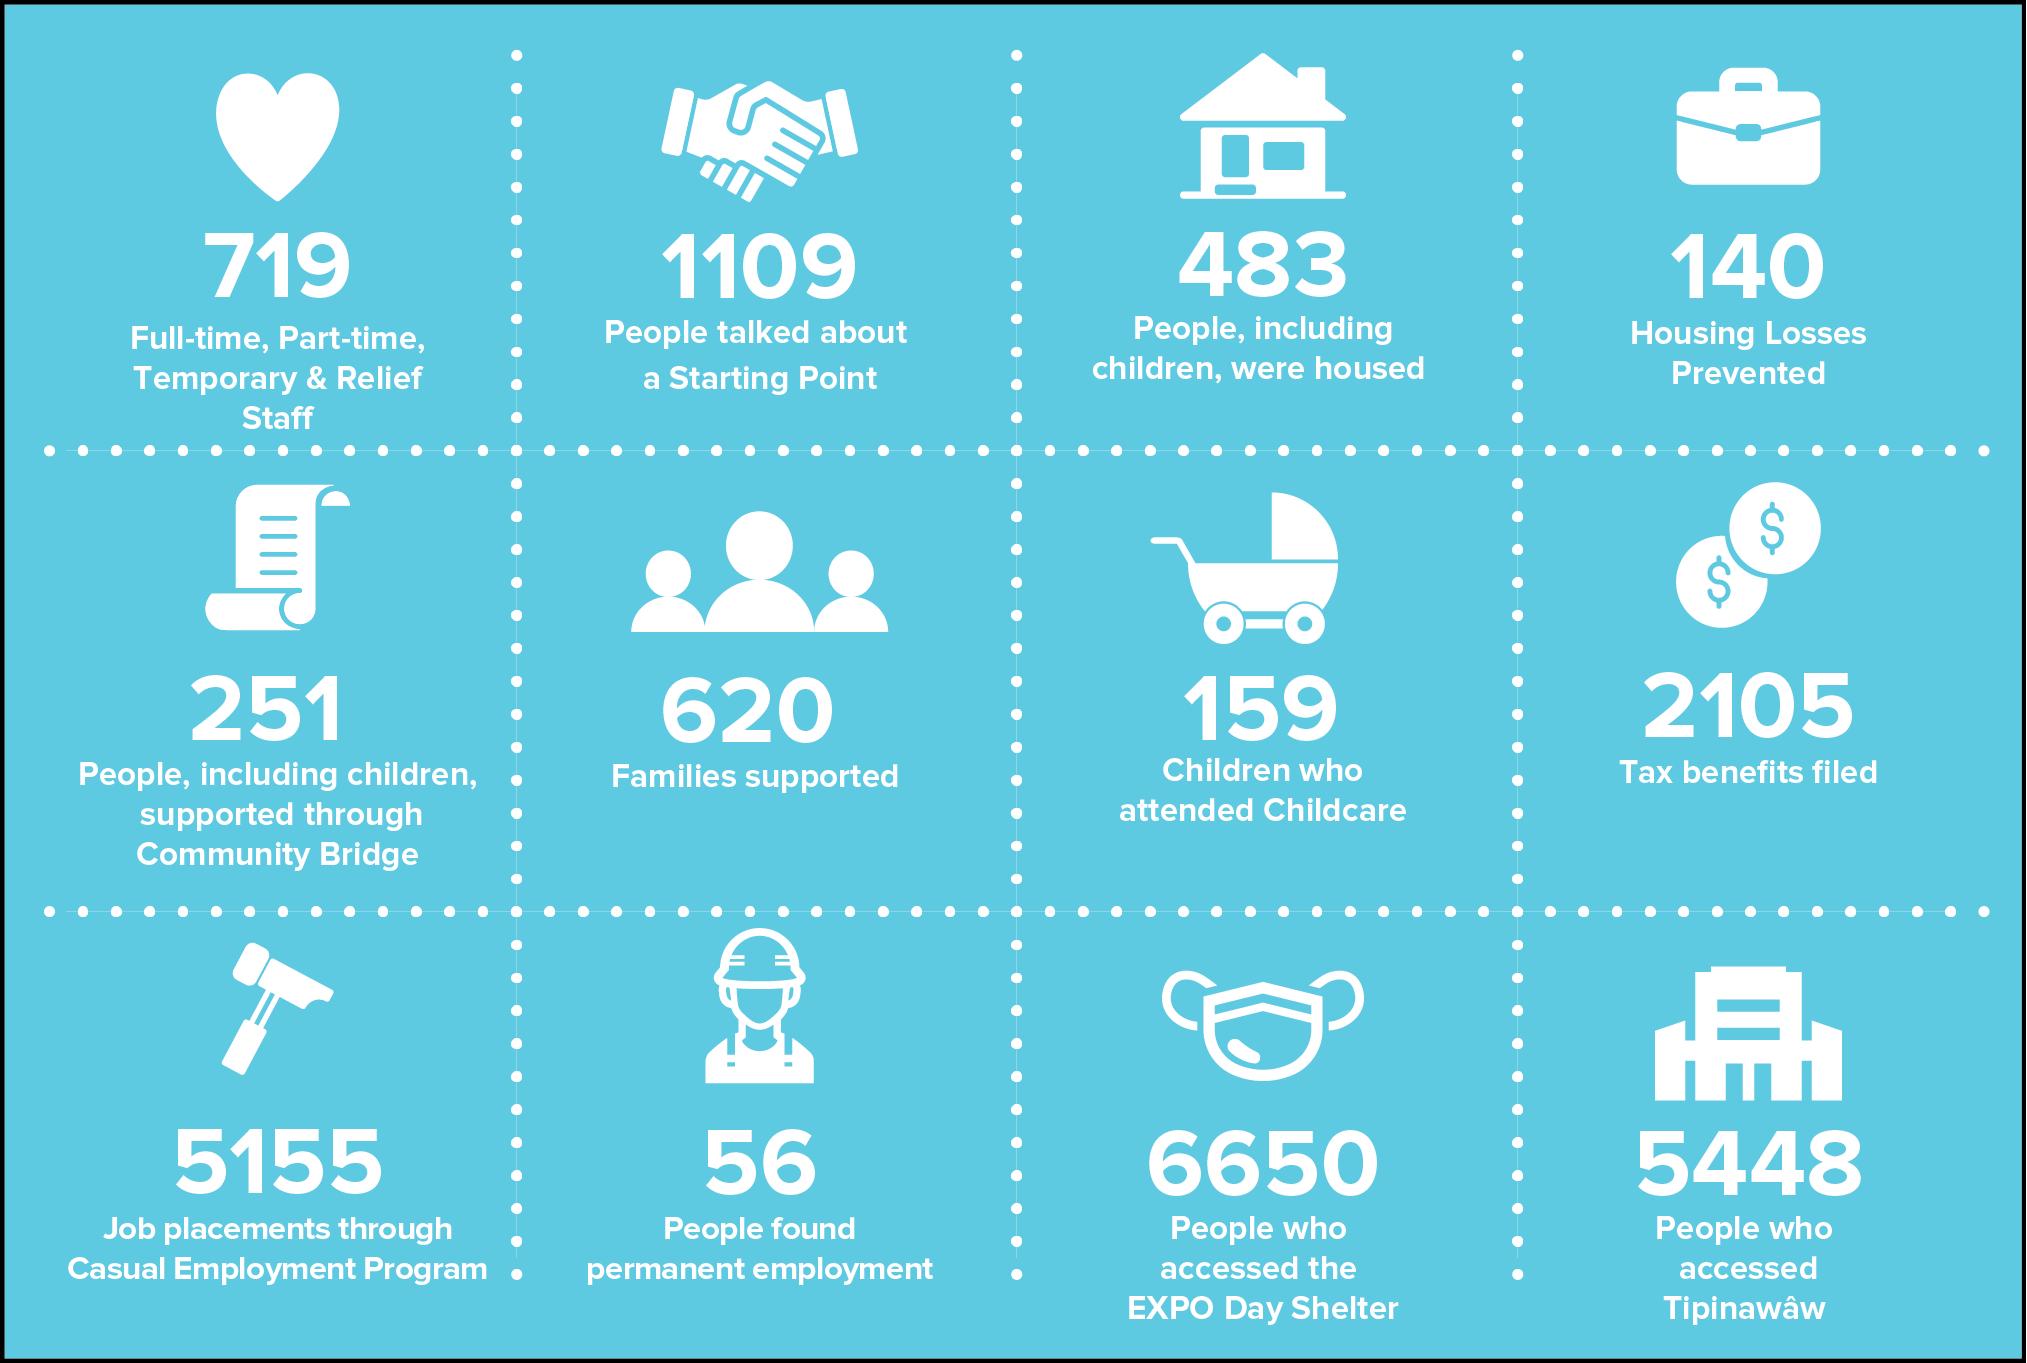 2020-2021 Statistics